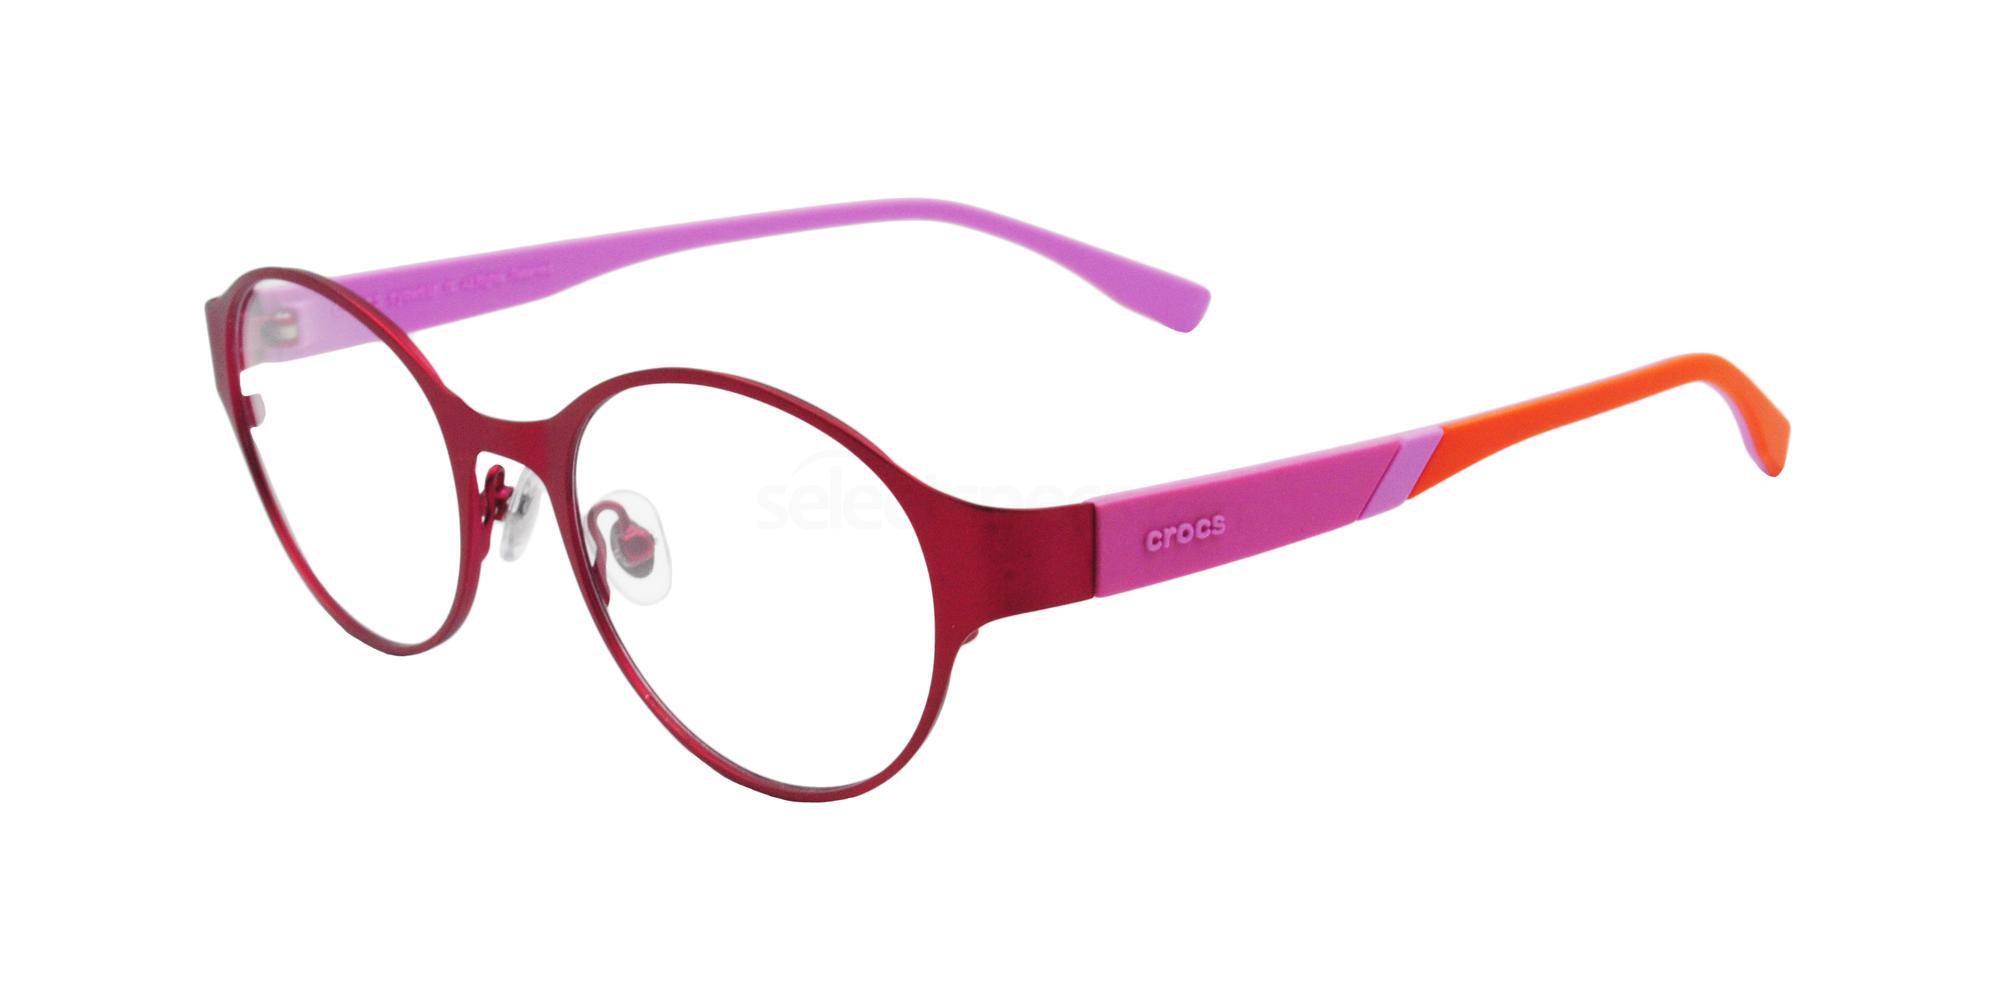 15VT CF3003 Glasses, Crocs Eyewear